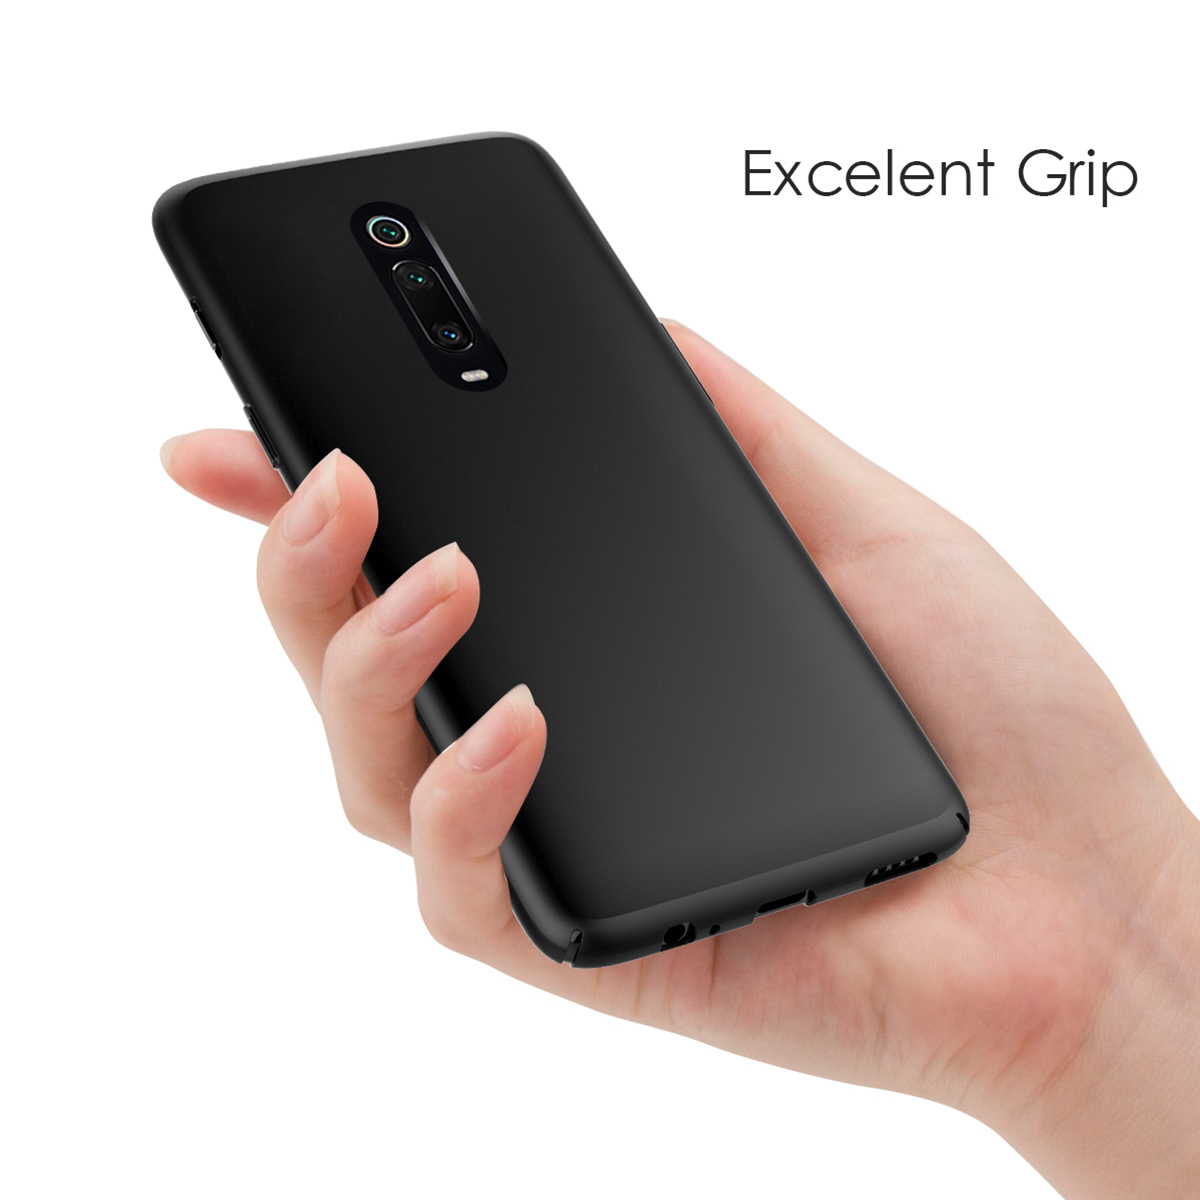 Shockproof Case for Xiaomi Mi 9T Mi 9T Pro Case Slim Soft Matte TPU Protective Silicone Cover for Xiaomi Mi 9T pro Mi9t Case in Fitted Cases from Cellphones Telecommunications